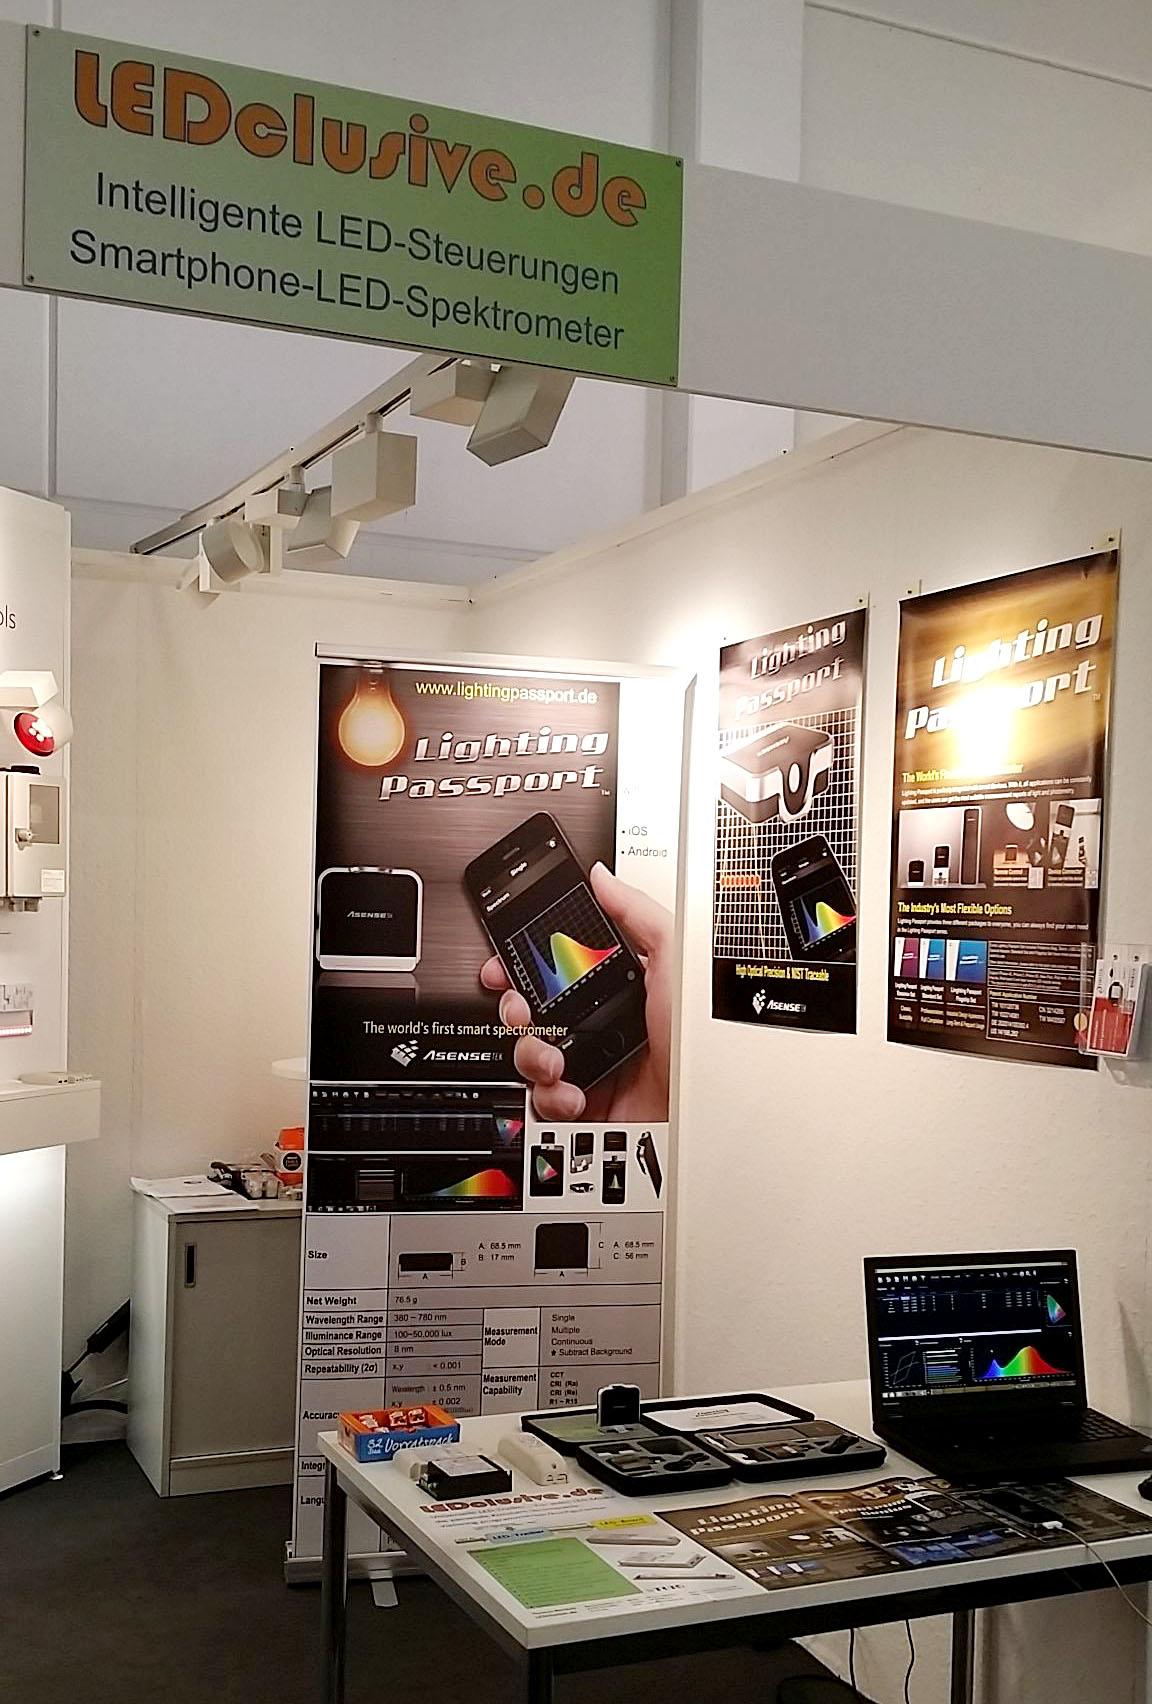 messestand lightingpassport Smart Spektrometer